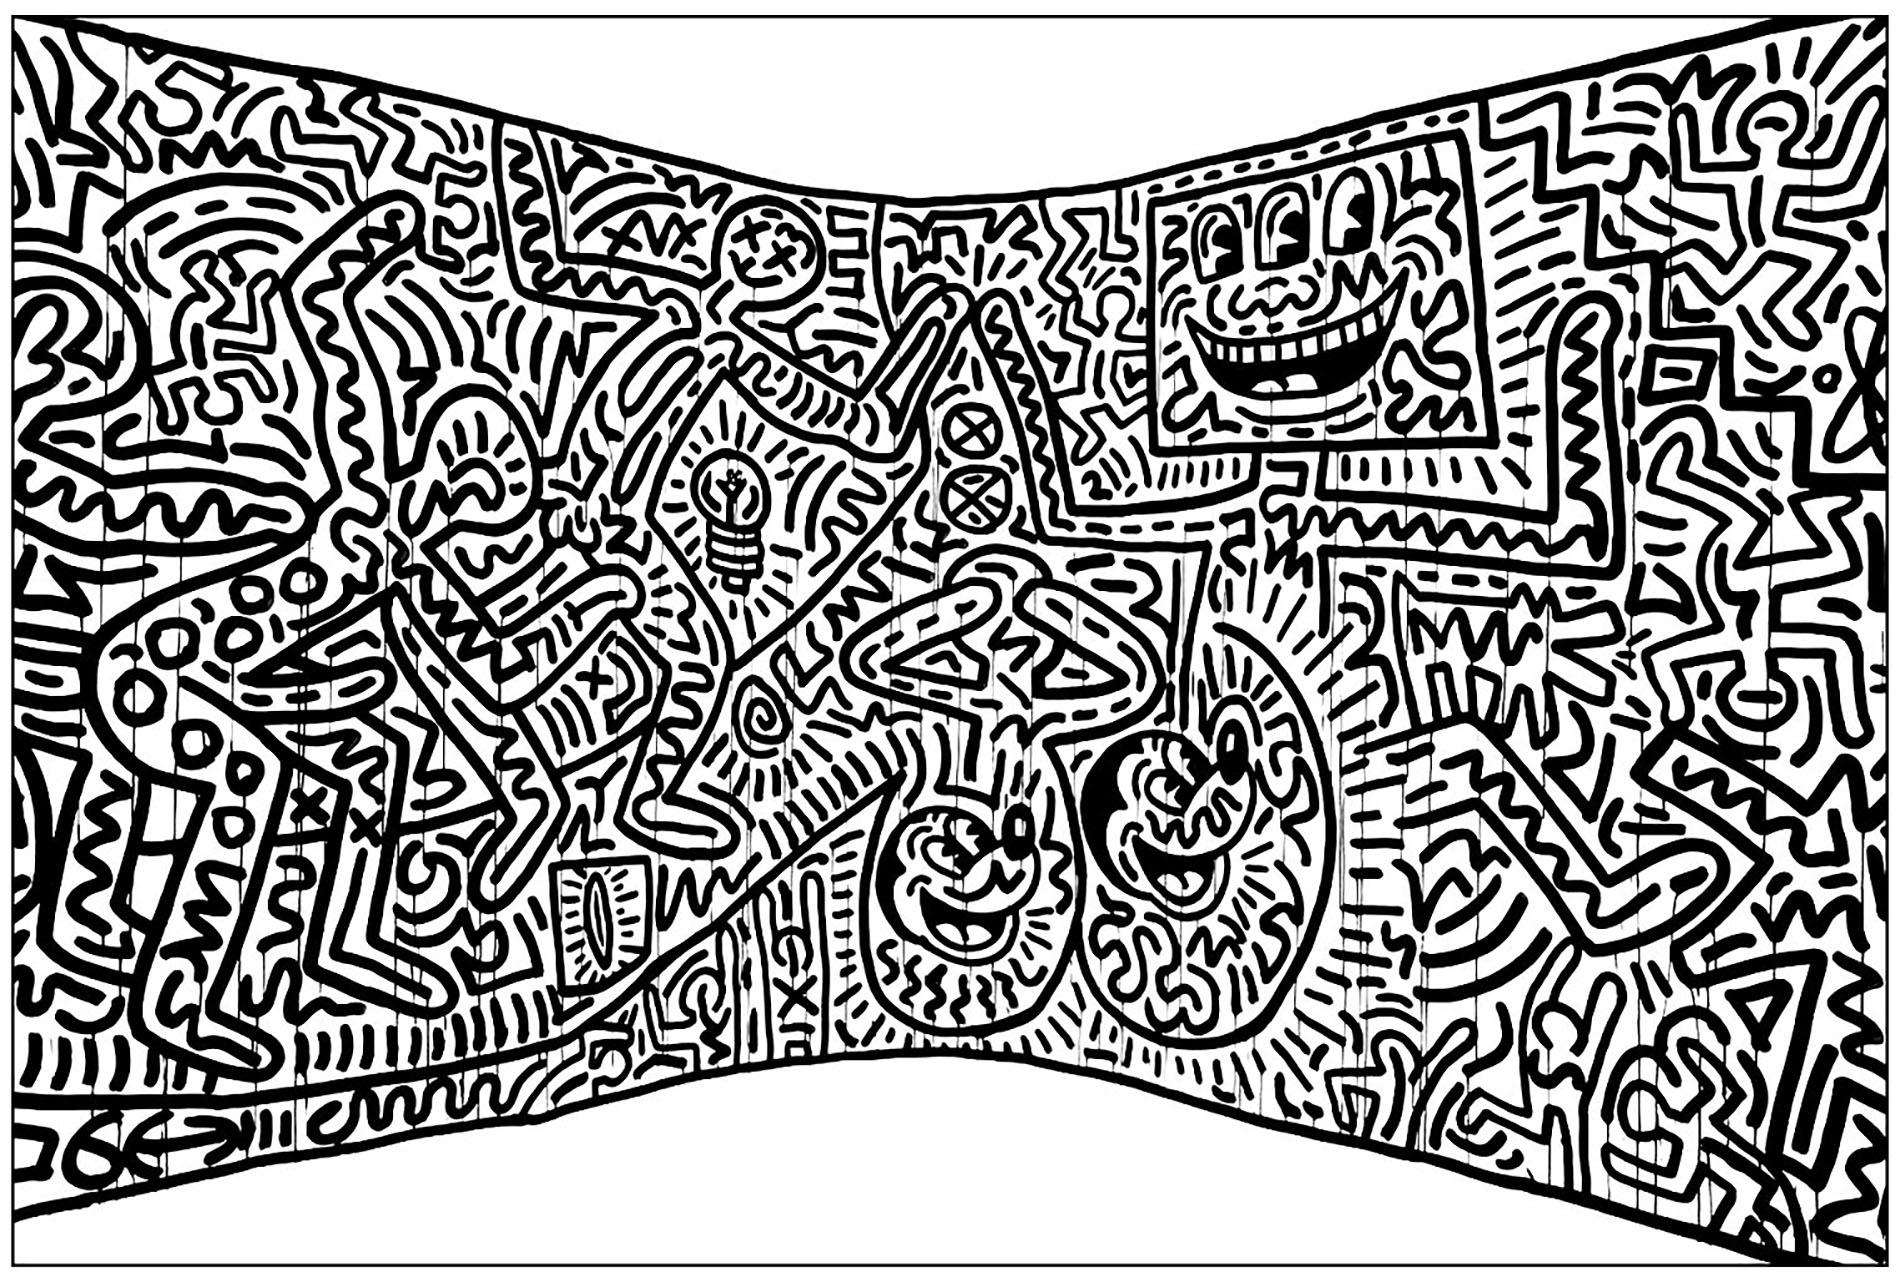 Beautiful Keith Haring coloring page